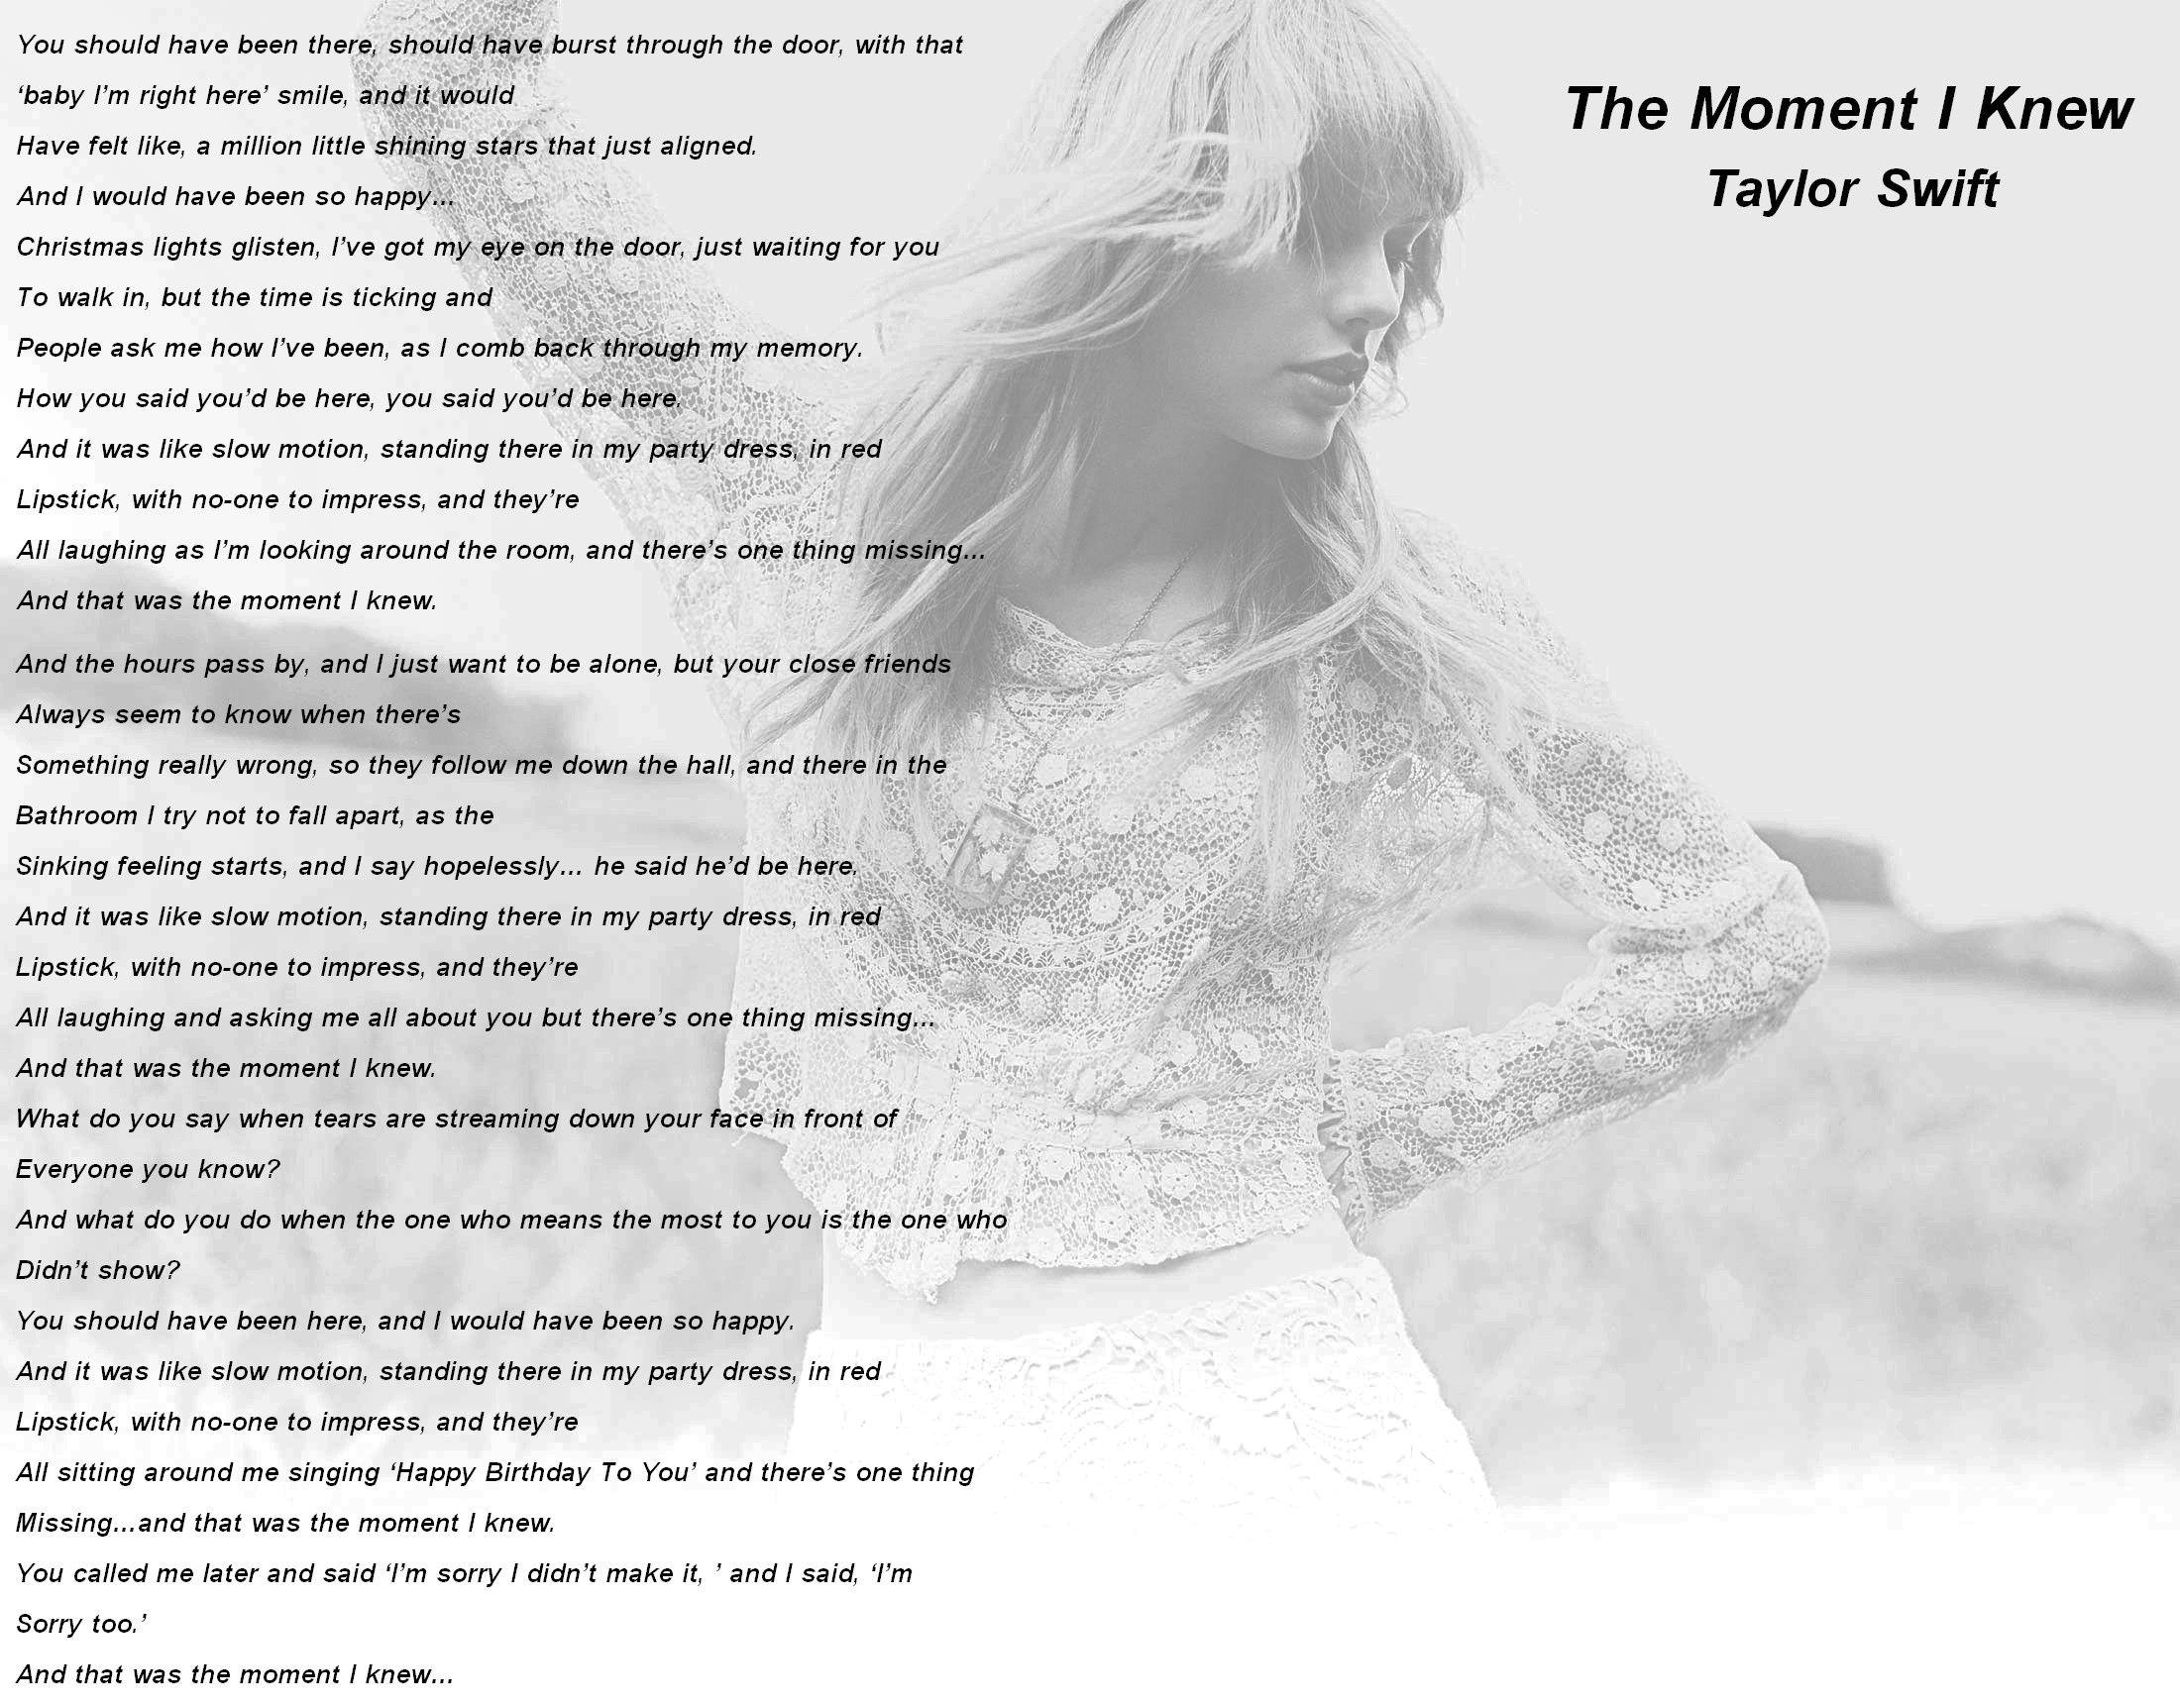 Taylor Swift – The Moment I Knew Lyrics   Genius Lyrics